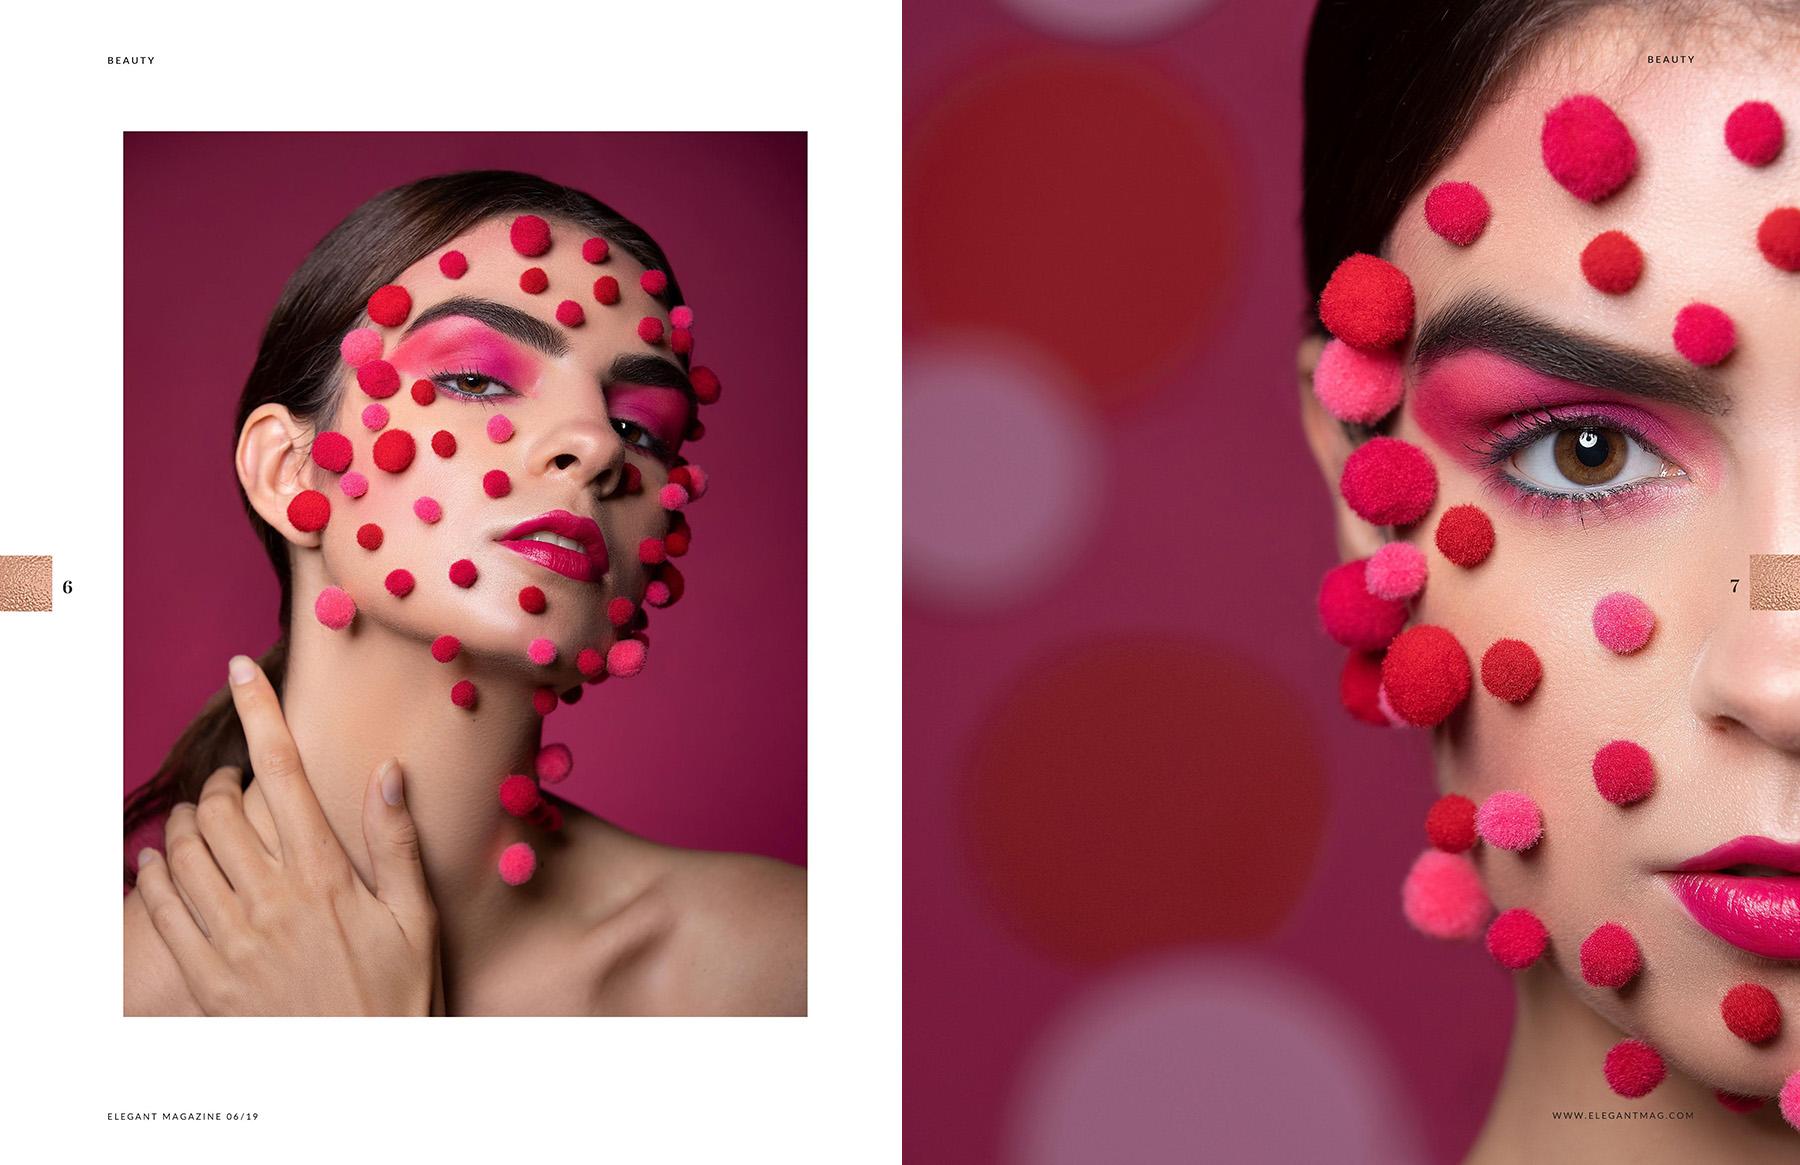 Editorial beauty photoshoot publication in Elegant Magazine by Loesje Kessels Fashion Photographer Dubai